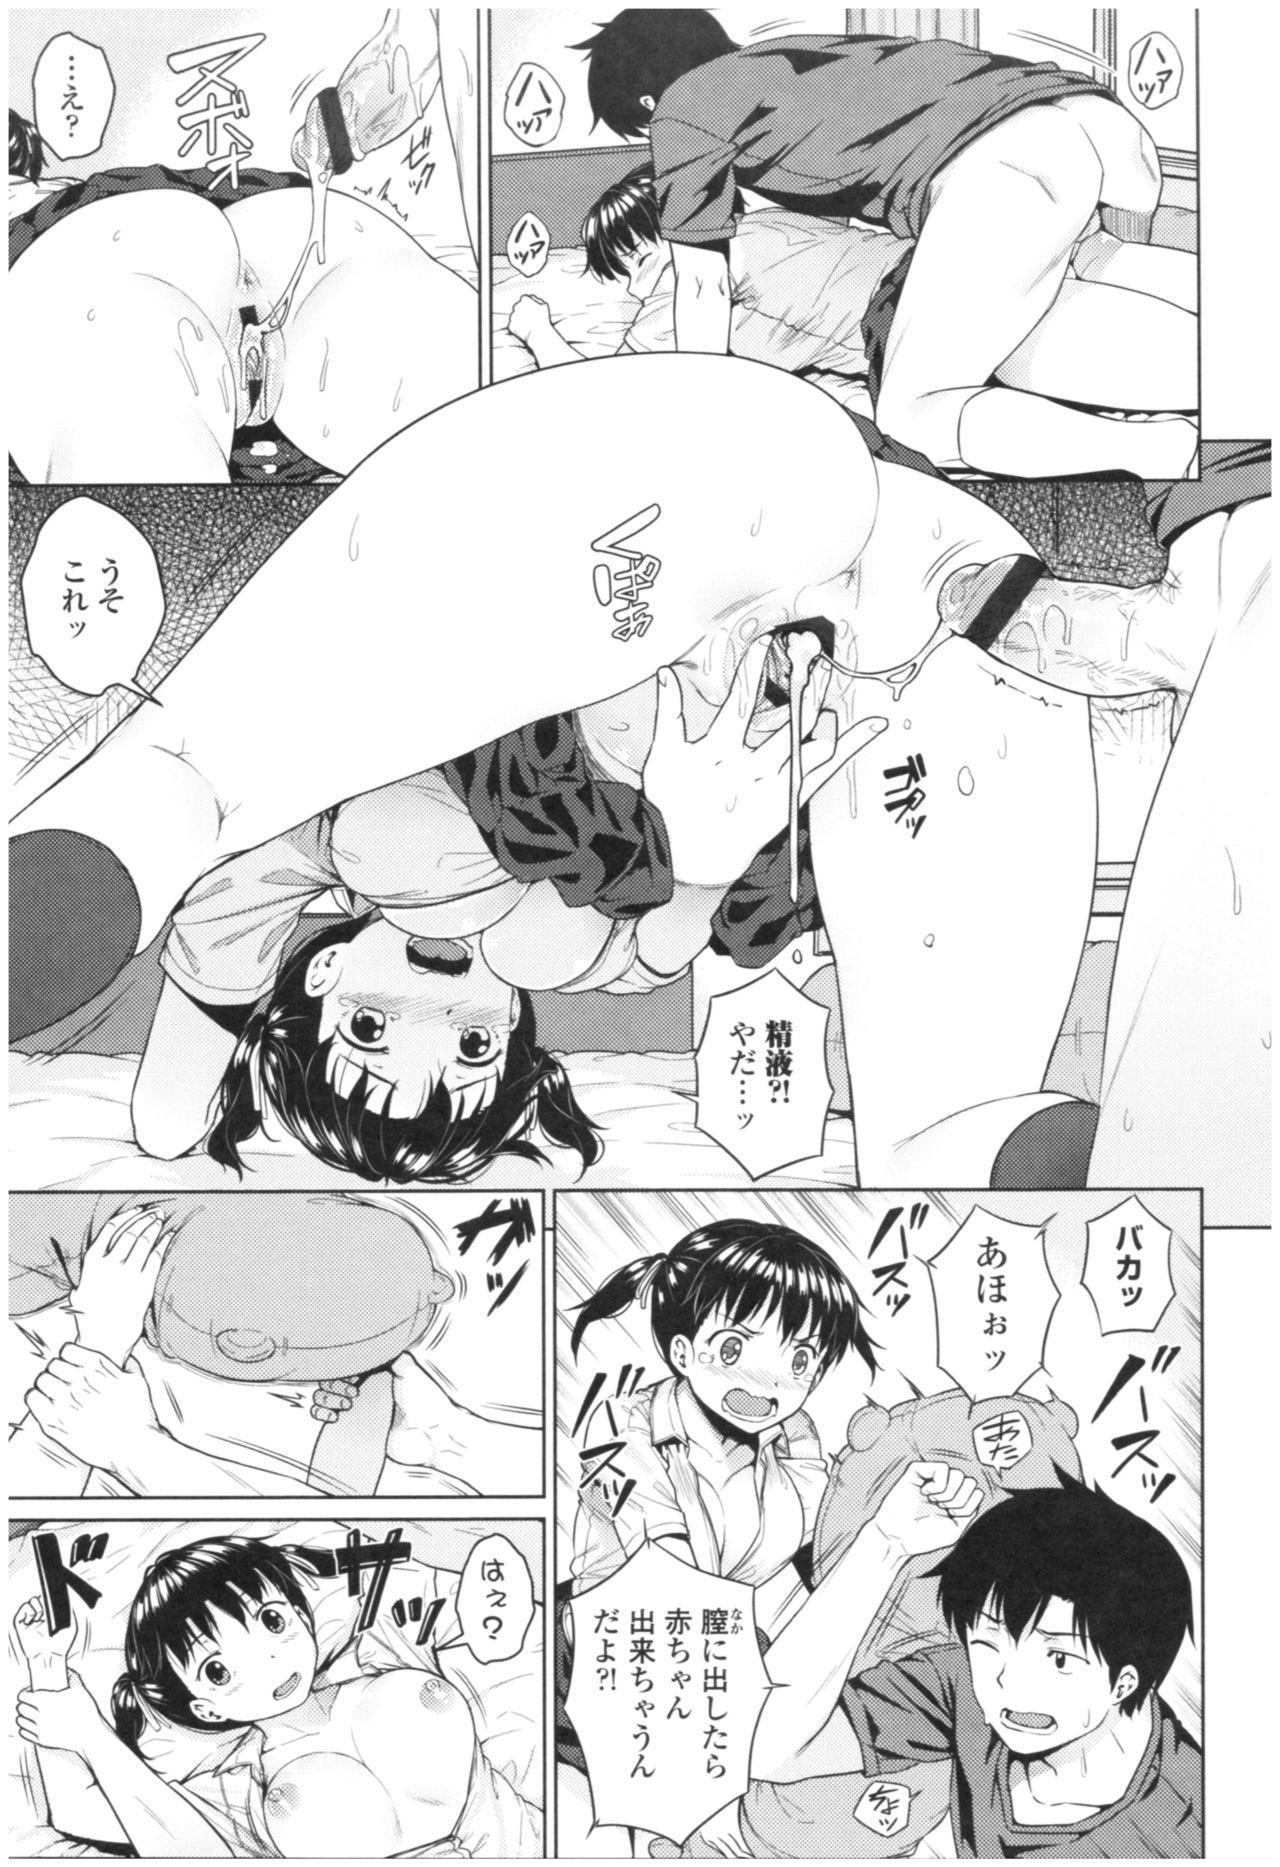 Bitch Kanojo no Hatsukoi Jouji - Her Lewd First Love and SEX 147